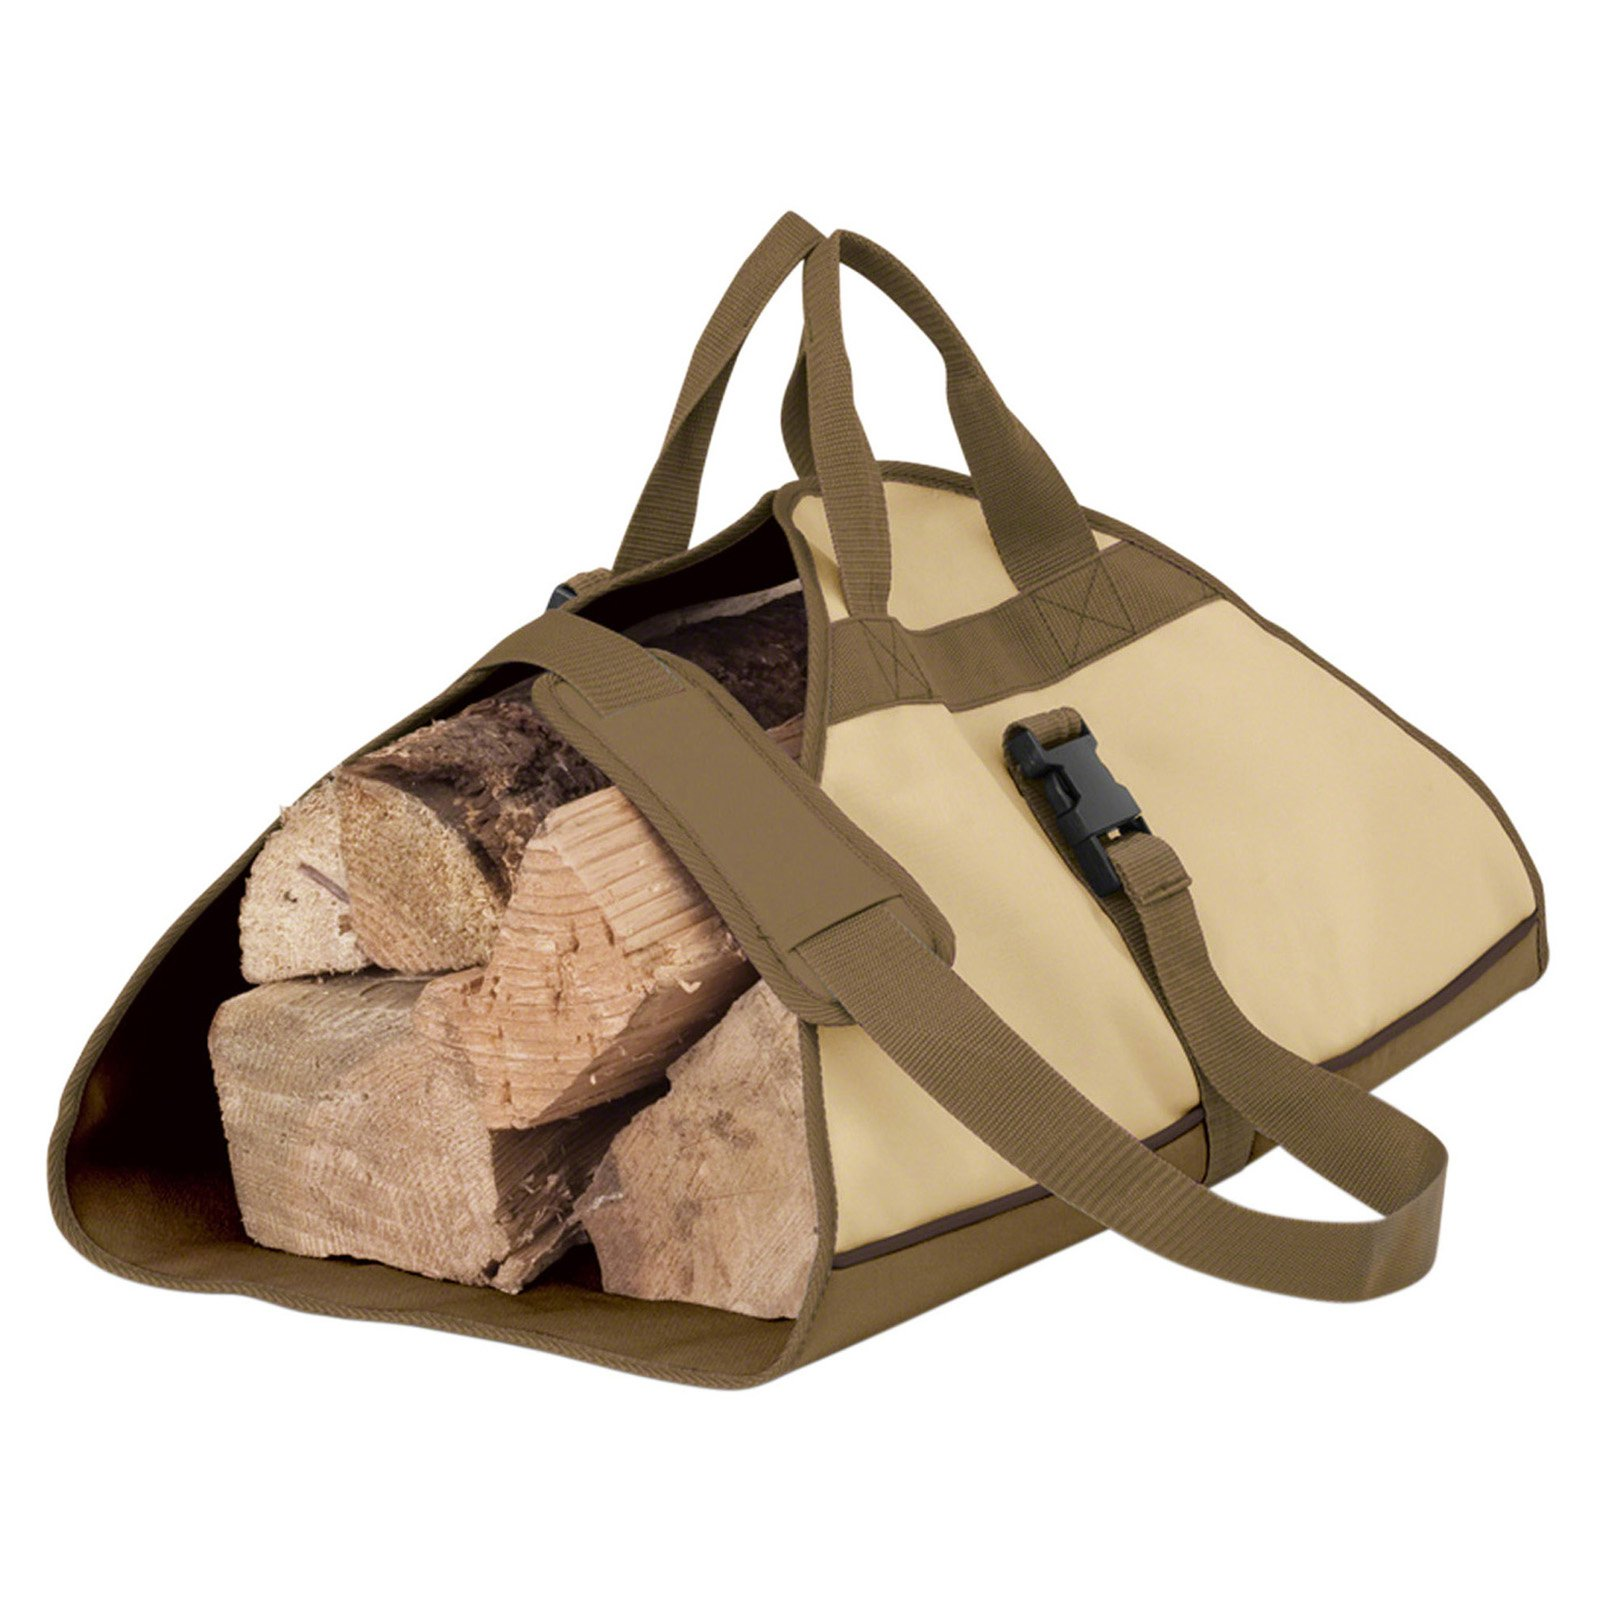 Classic Accessories Veranda Fireplace Firewood Log Carrier